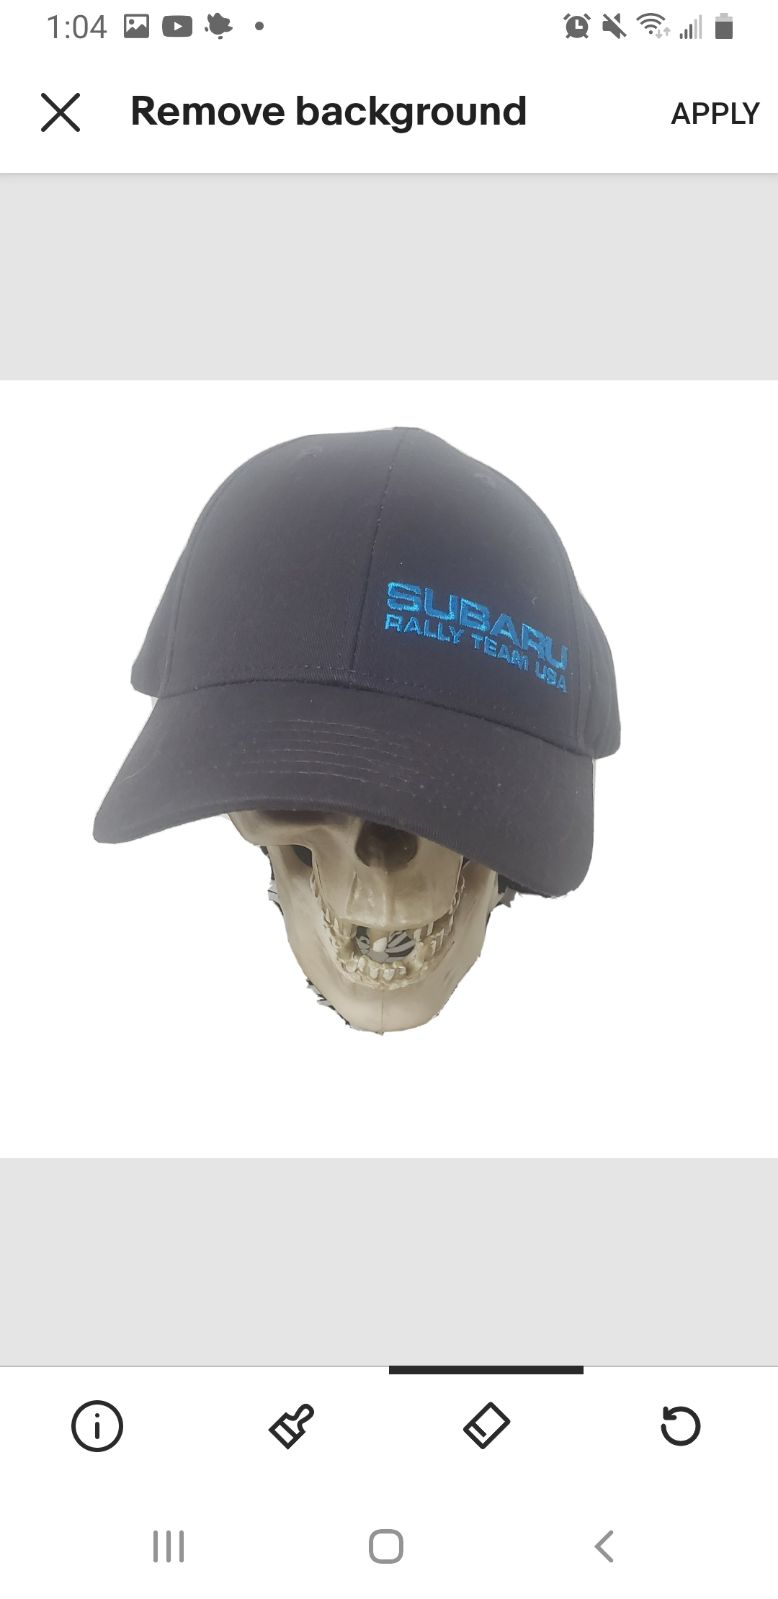 Subaru rally team usa hat snap back